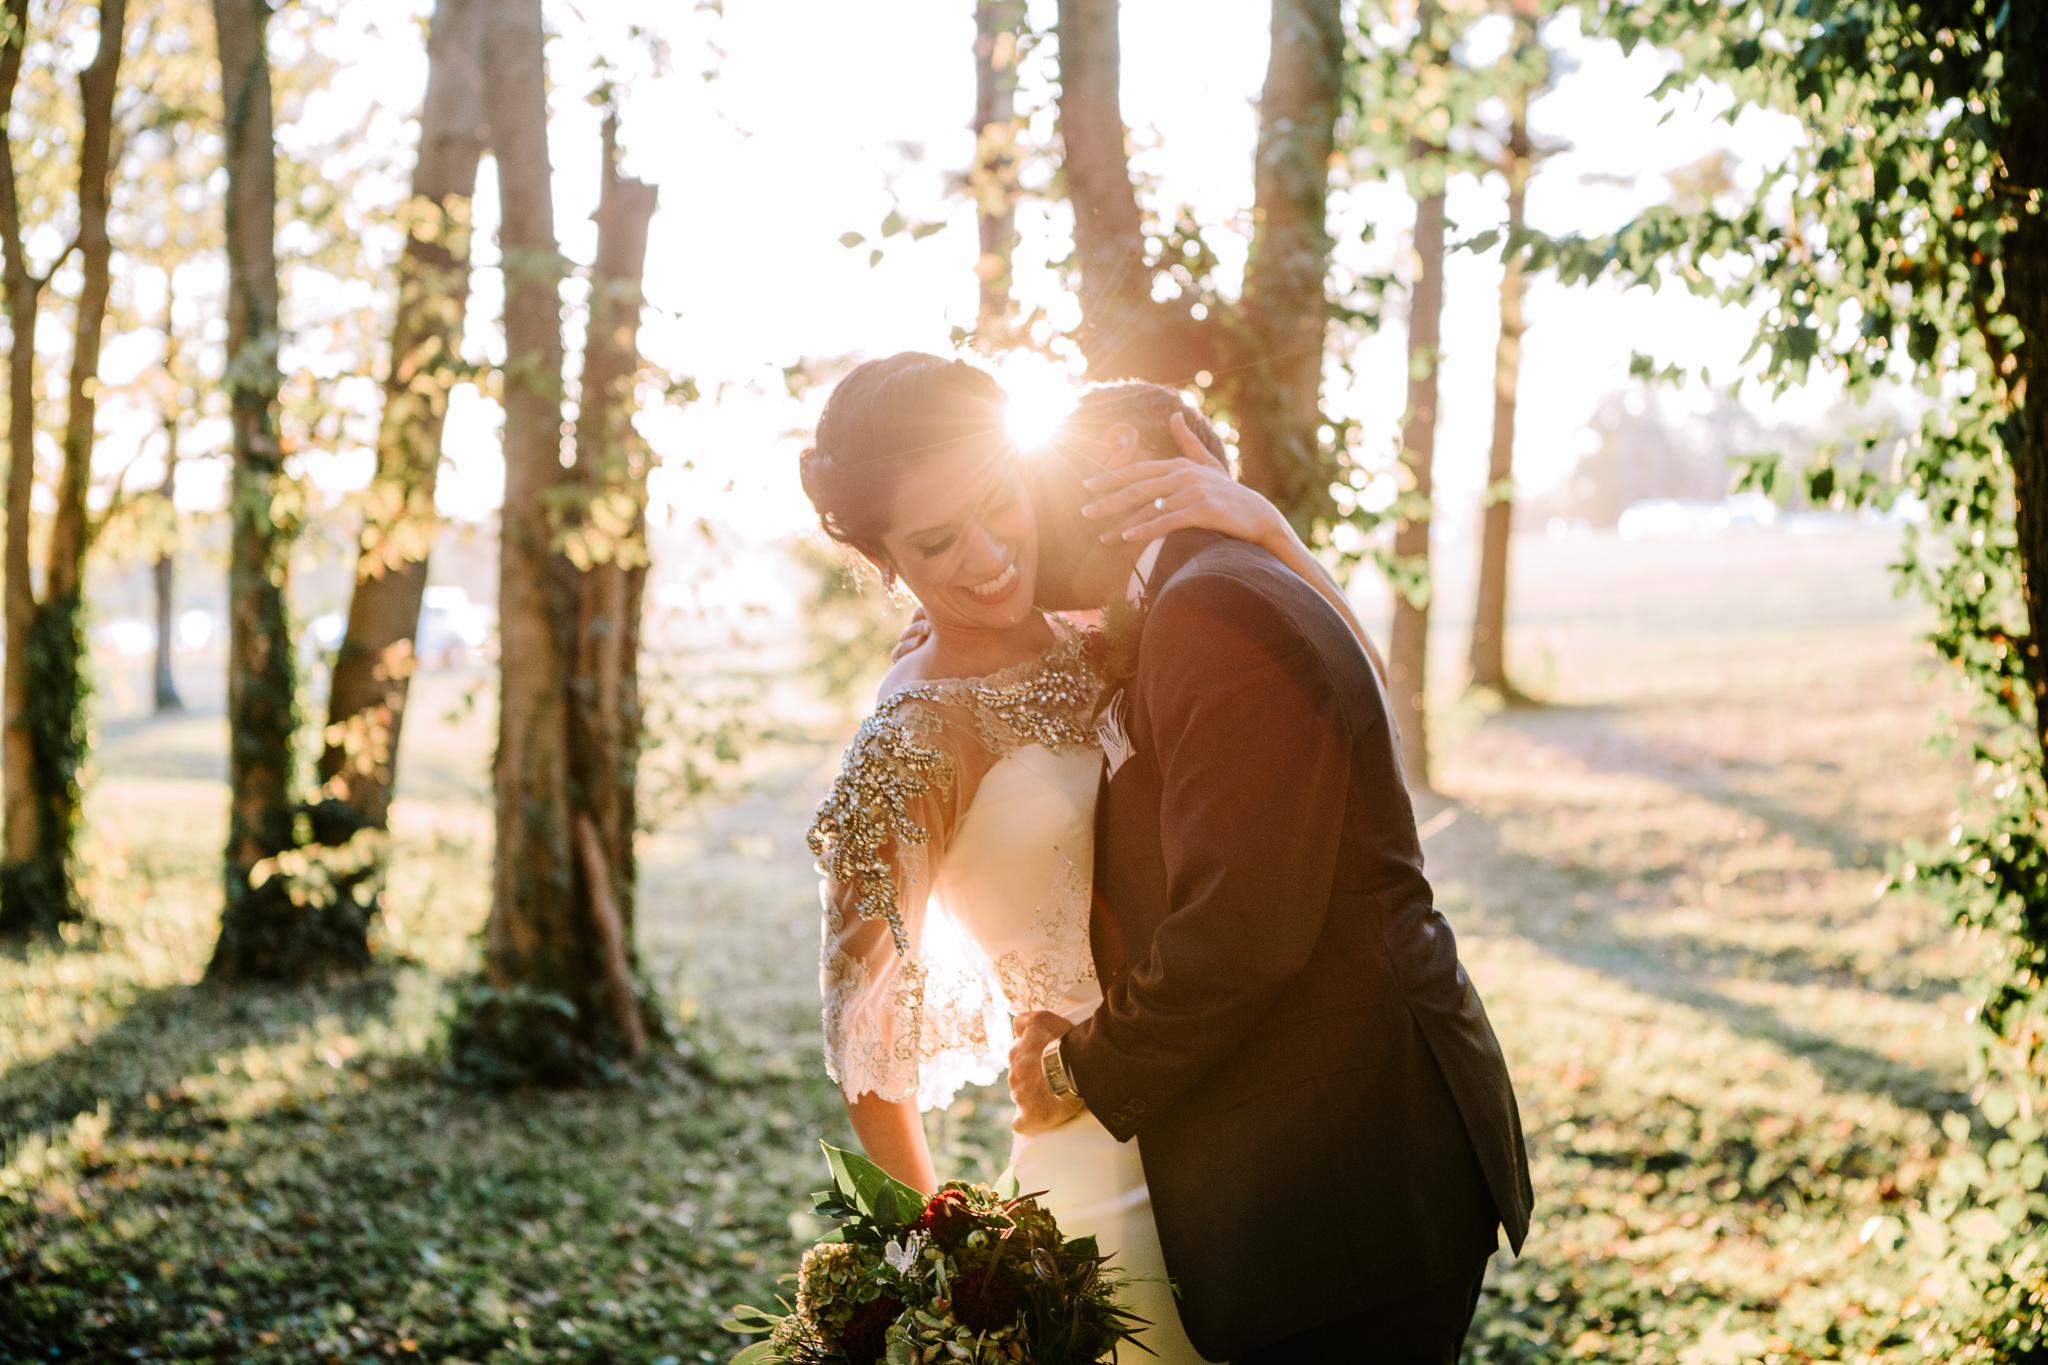 Richmond Kentucky Wedding Photographer - Ariana Jordan Photography -14.jpg